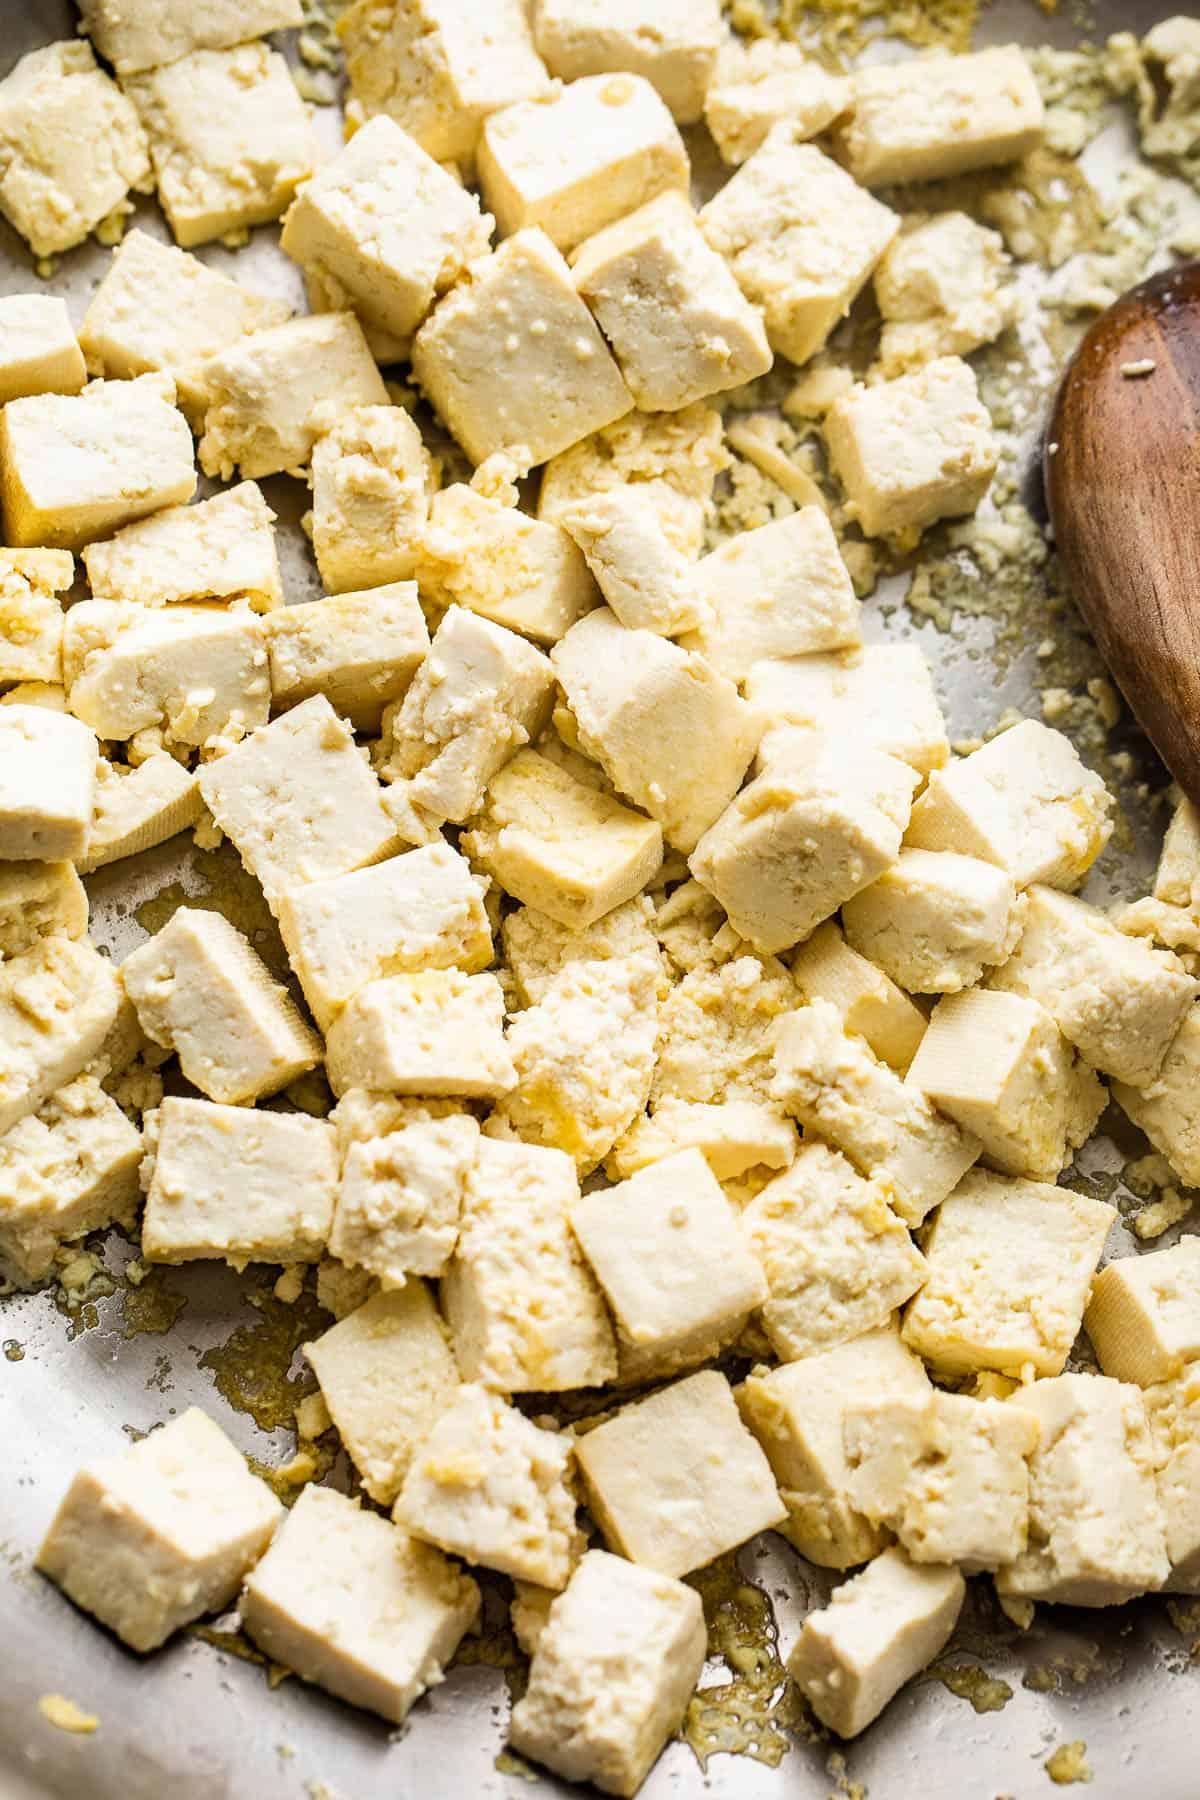 frying cubed tofu